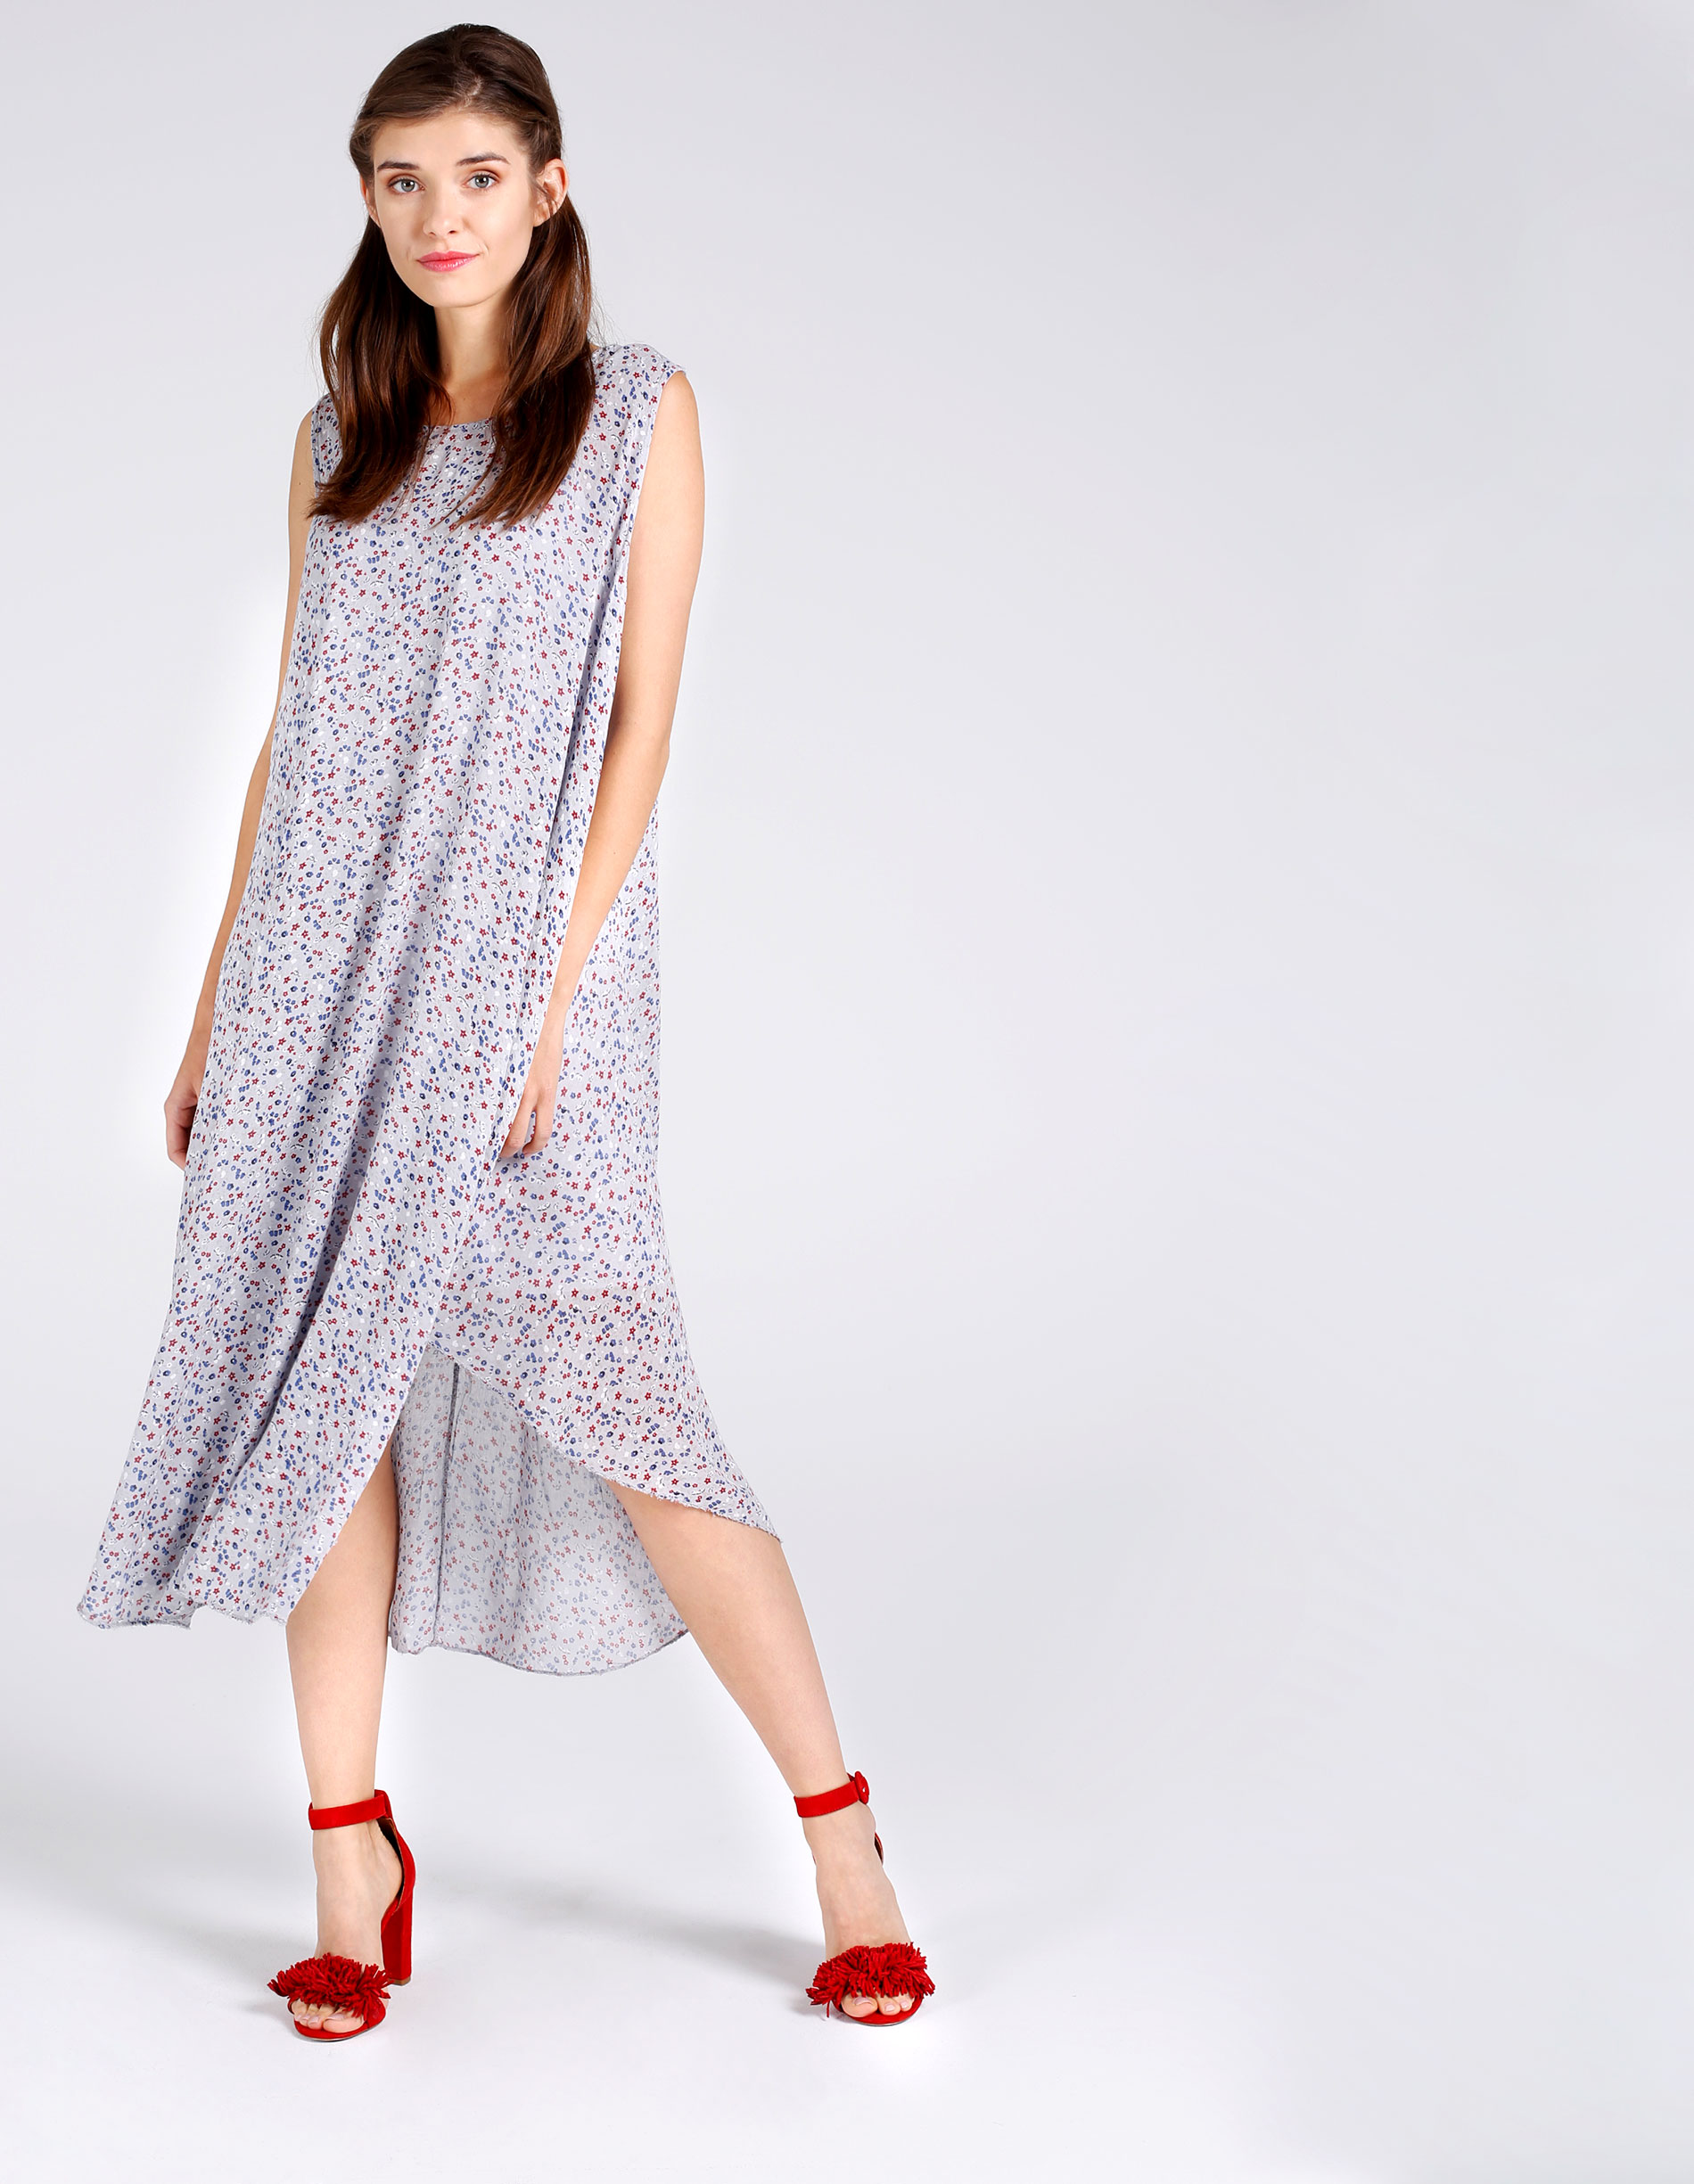 Sukienka - 32-1519C GRCH - Unisono